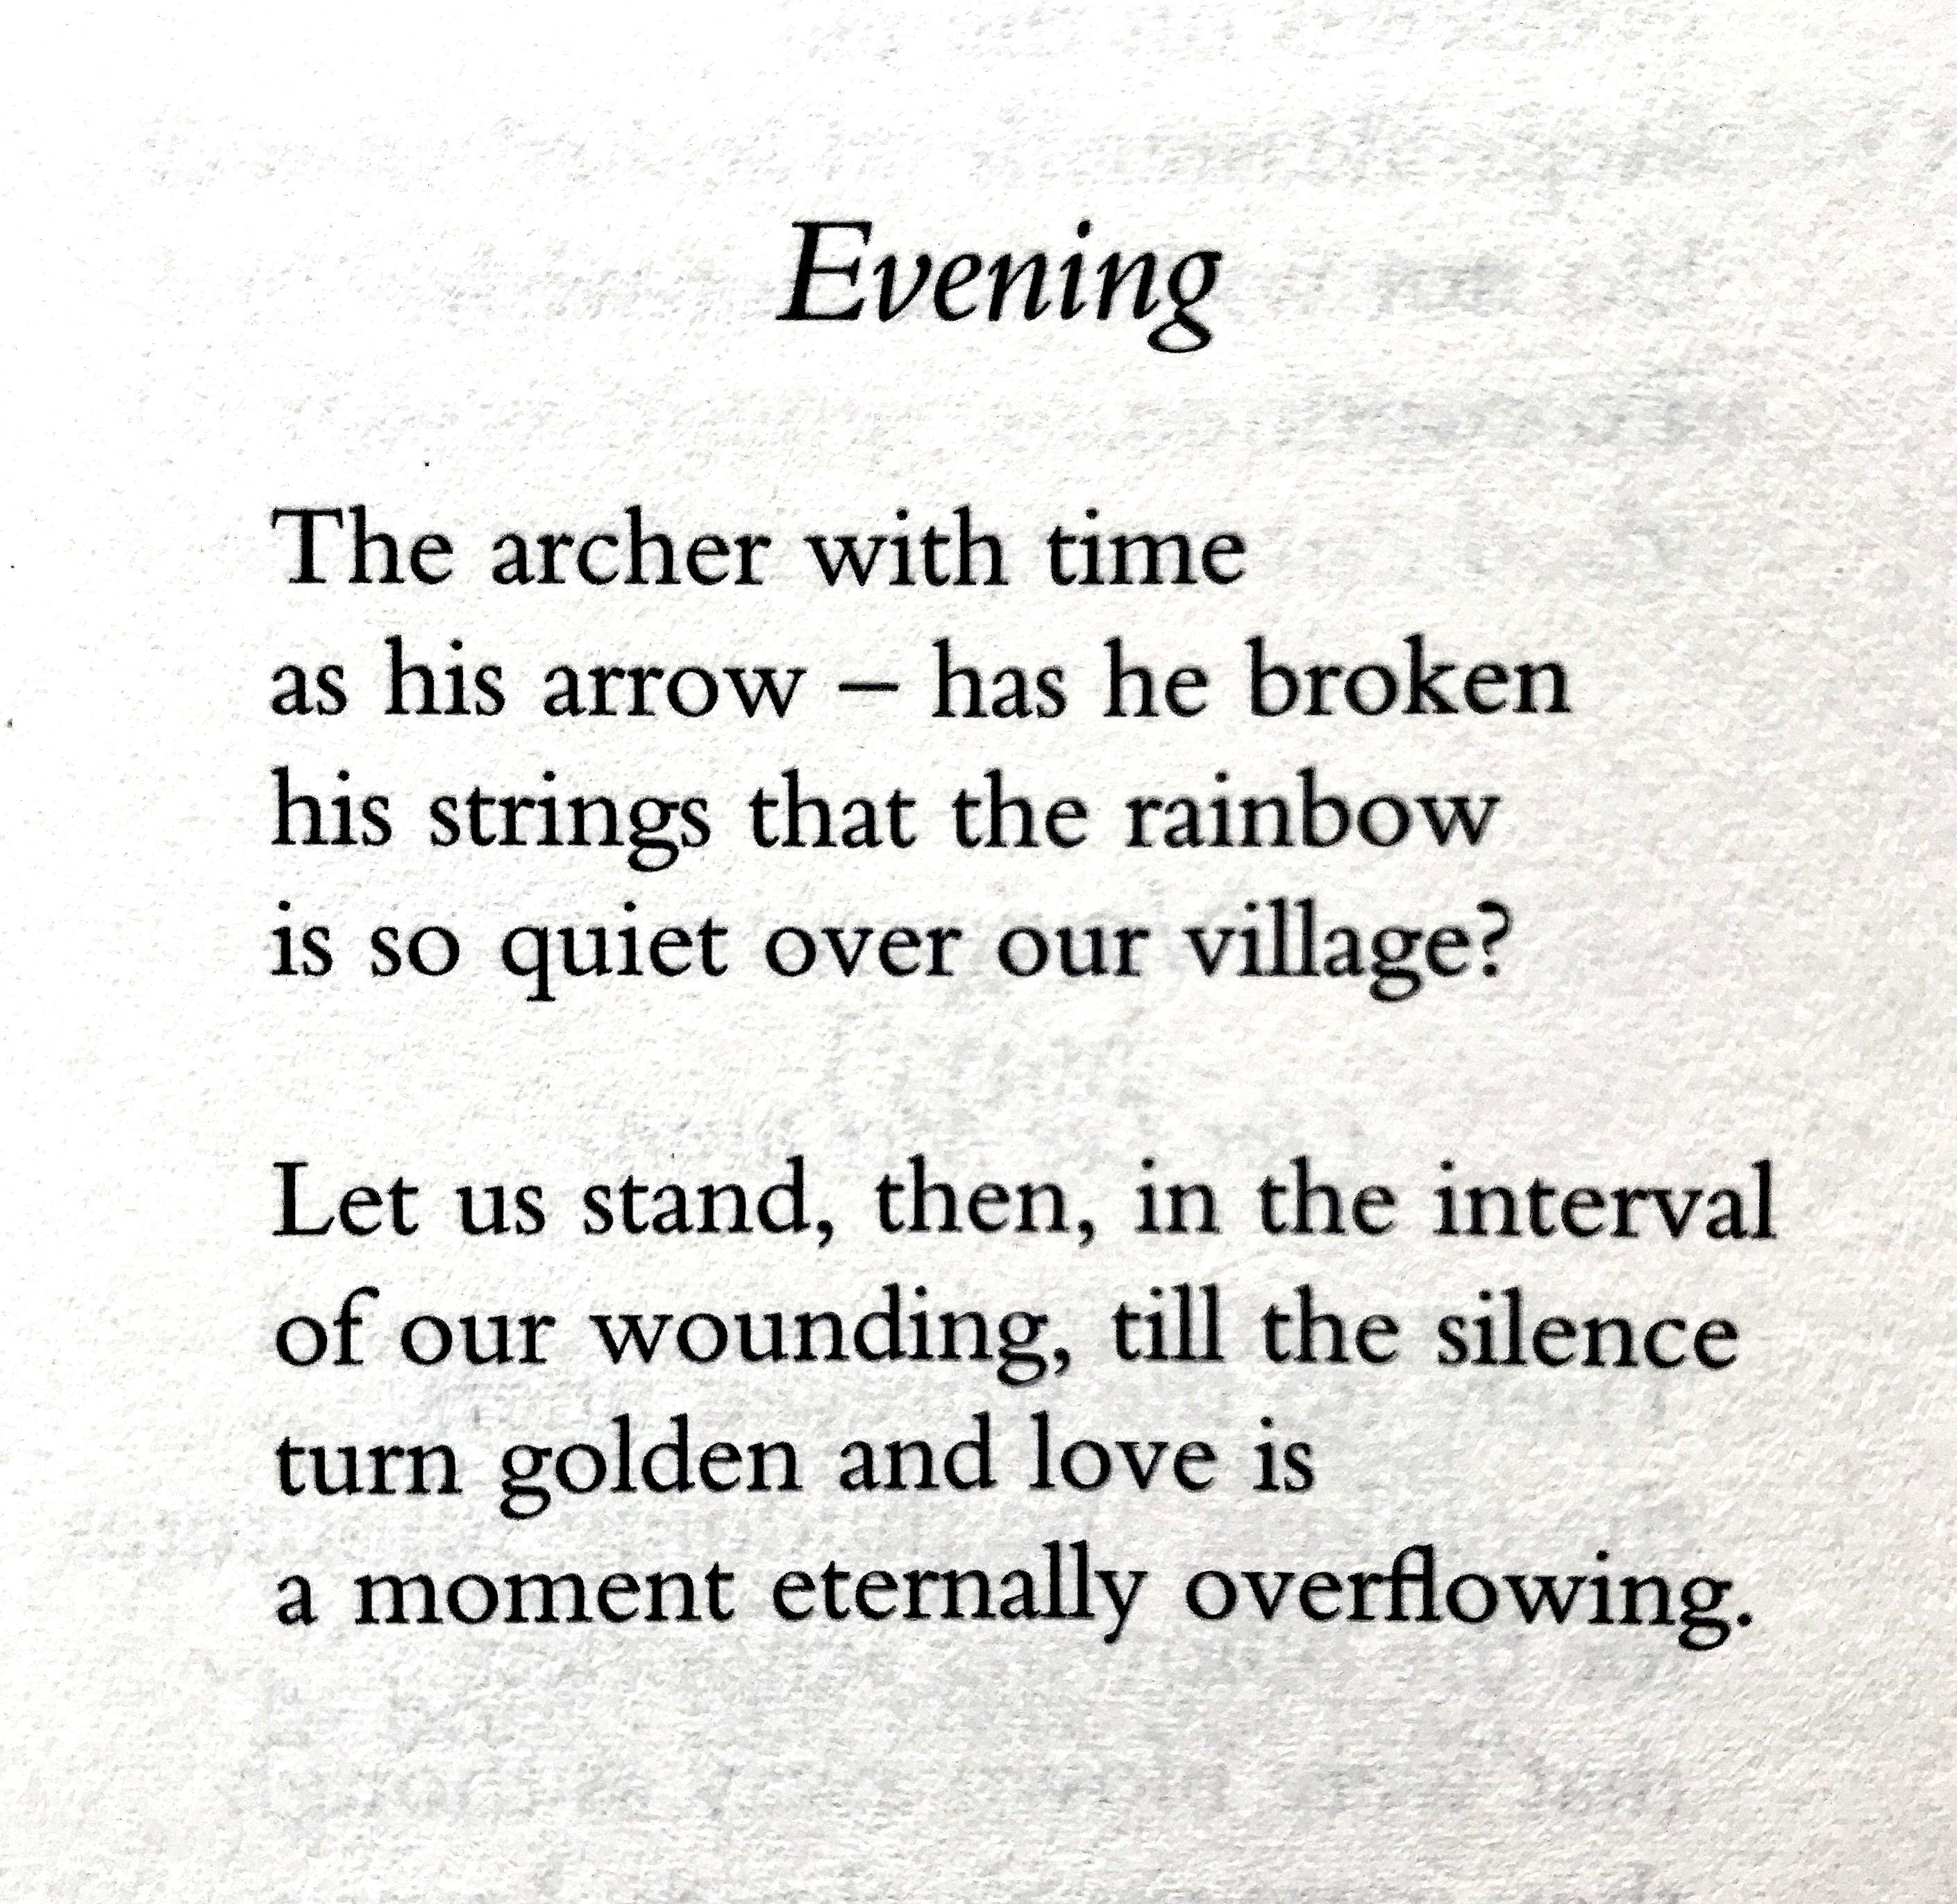 ronald stuart thomas evening poetry pinterest edgar allan